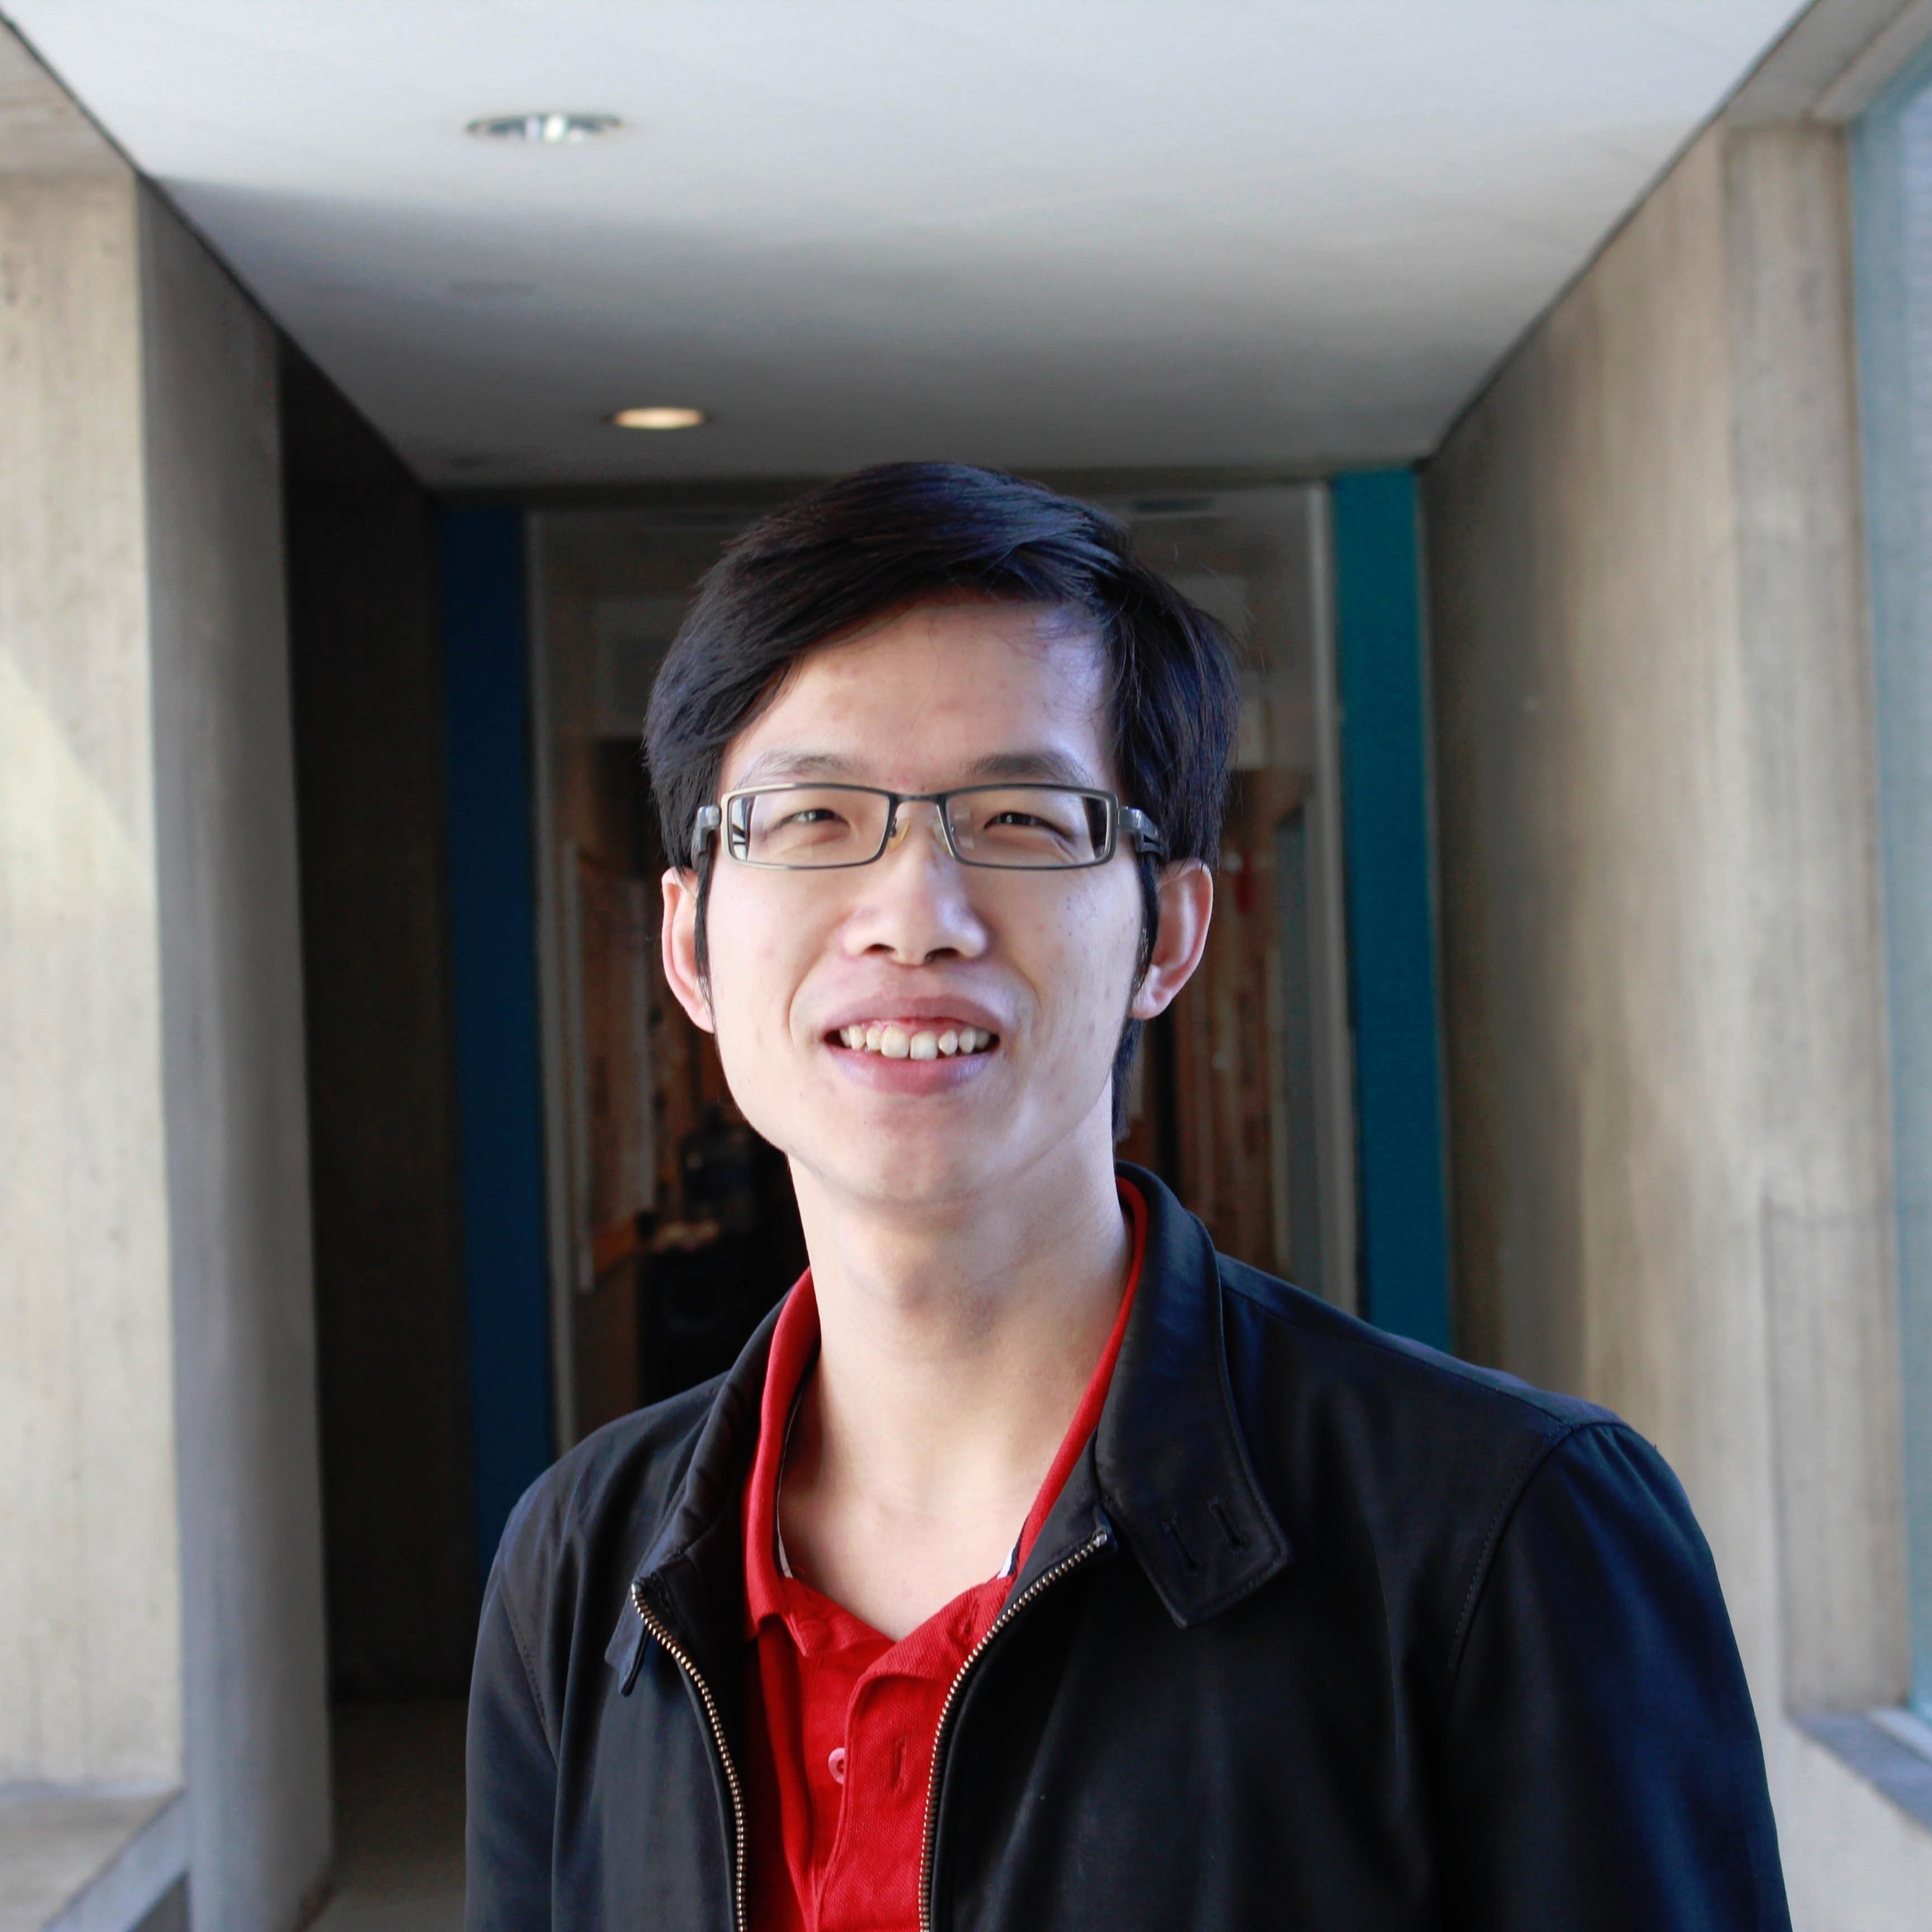 Edwin Khoo